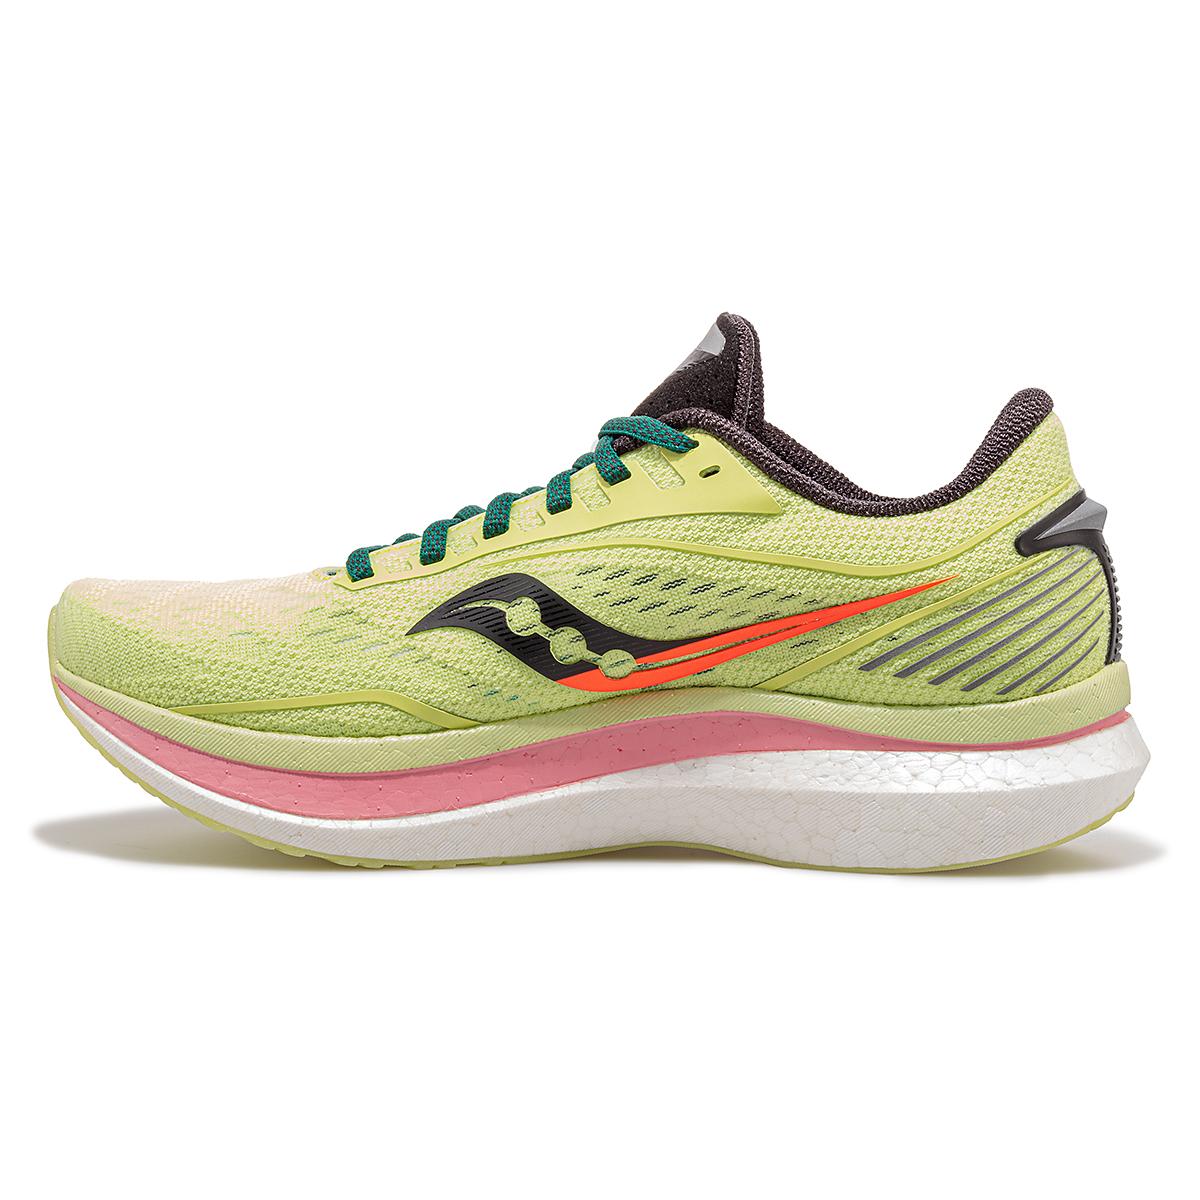 Women's Saucony Jackalope 2.0 Endorphin Speed Running Shoe - Color: Jackalope - Size: 5 - Width: Regular, Jackalope, large, image 4